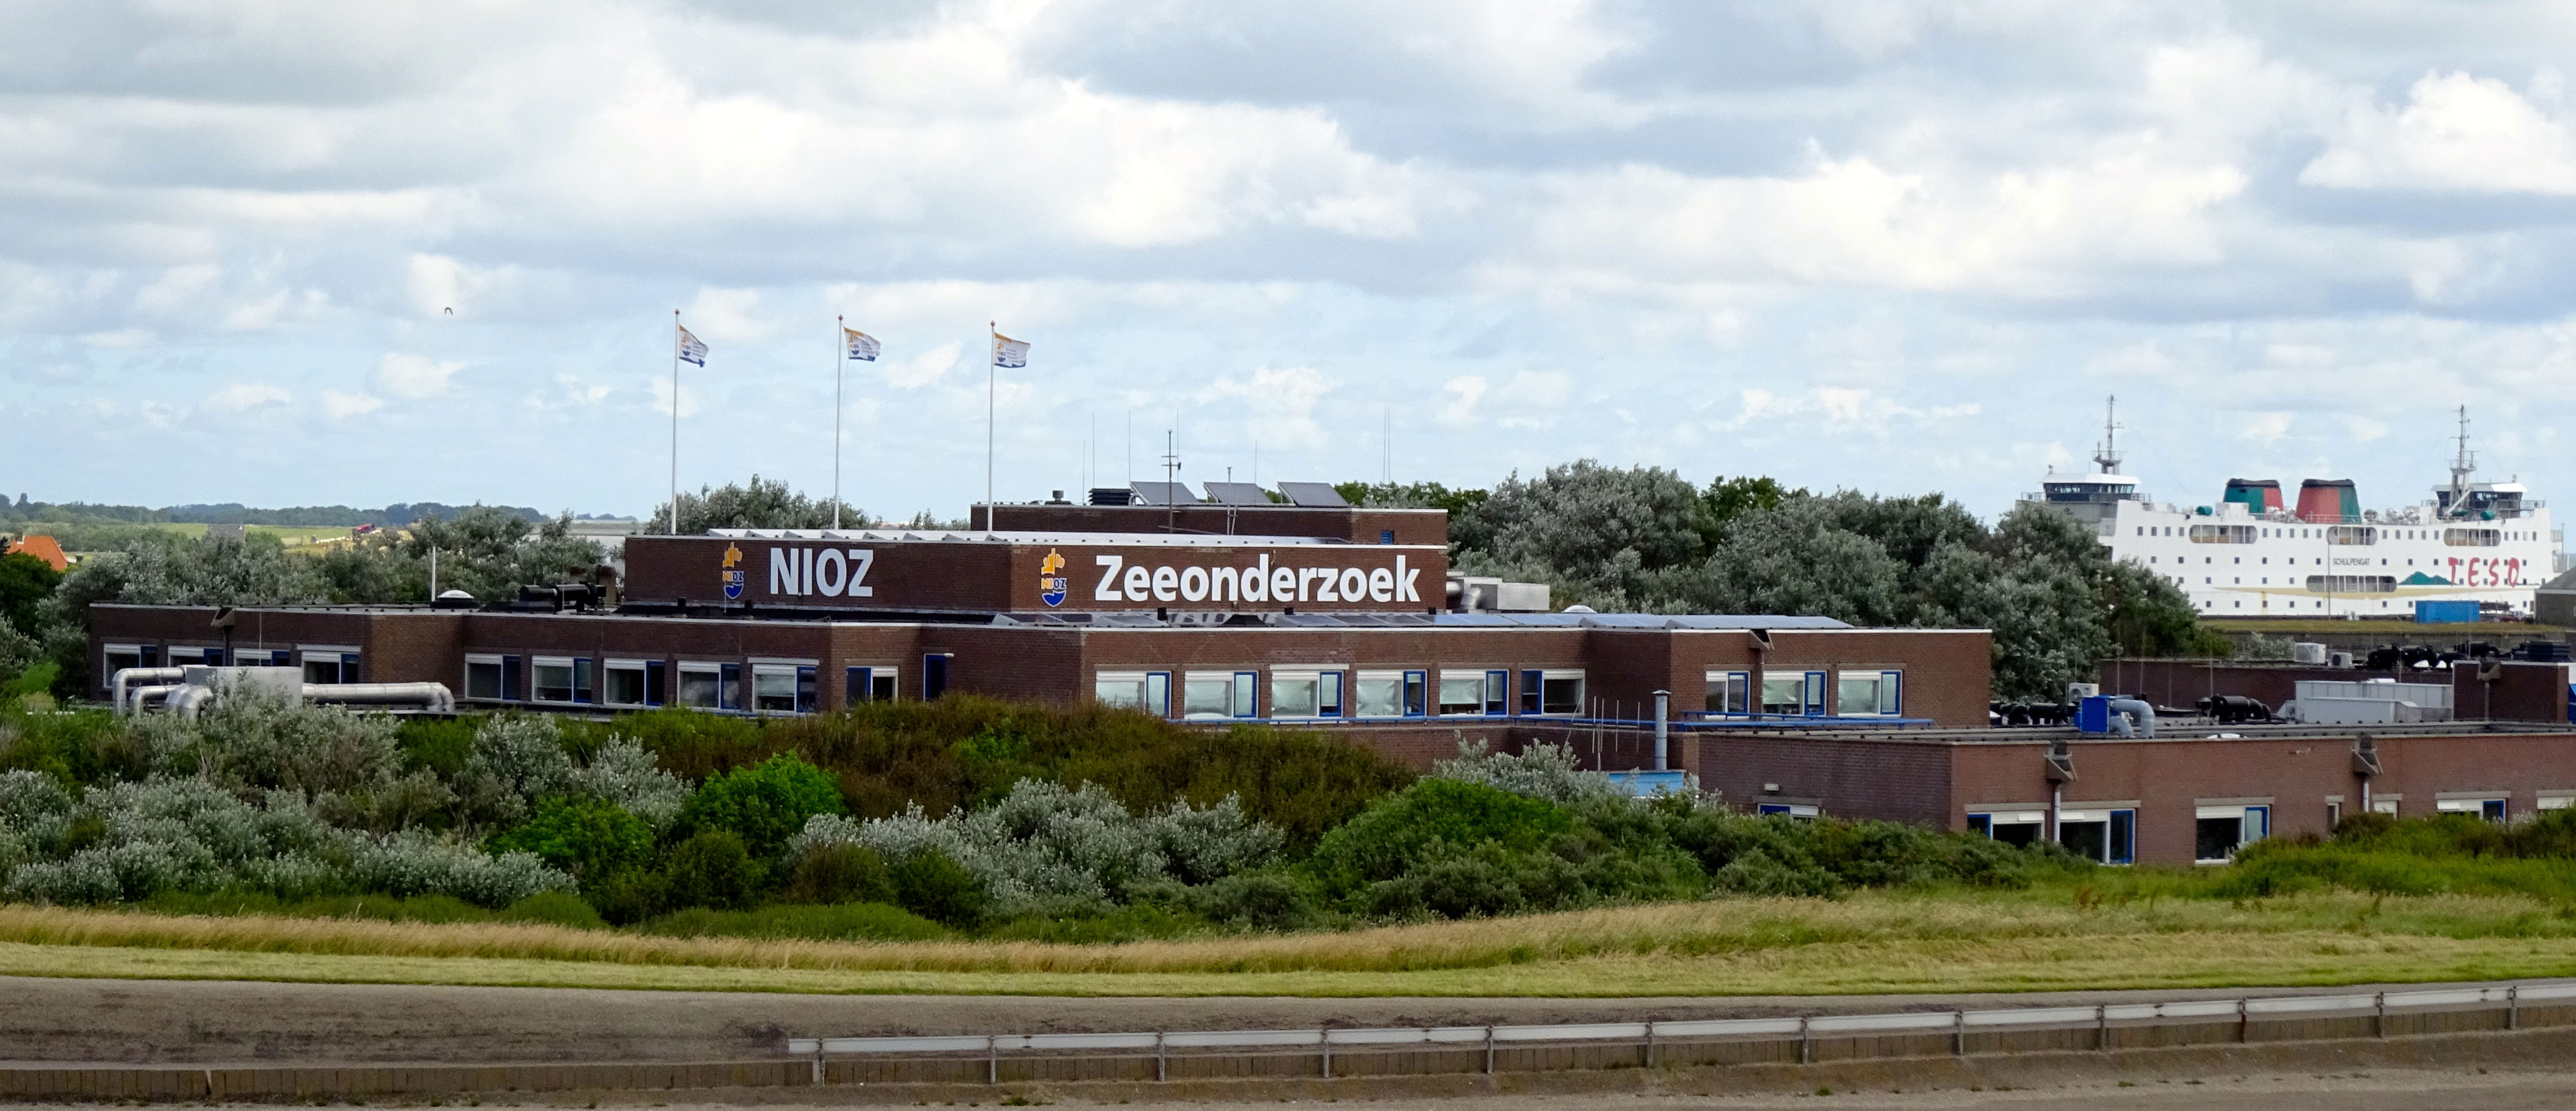 NIOZ Texel